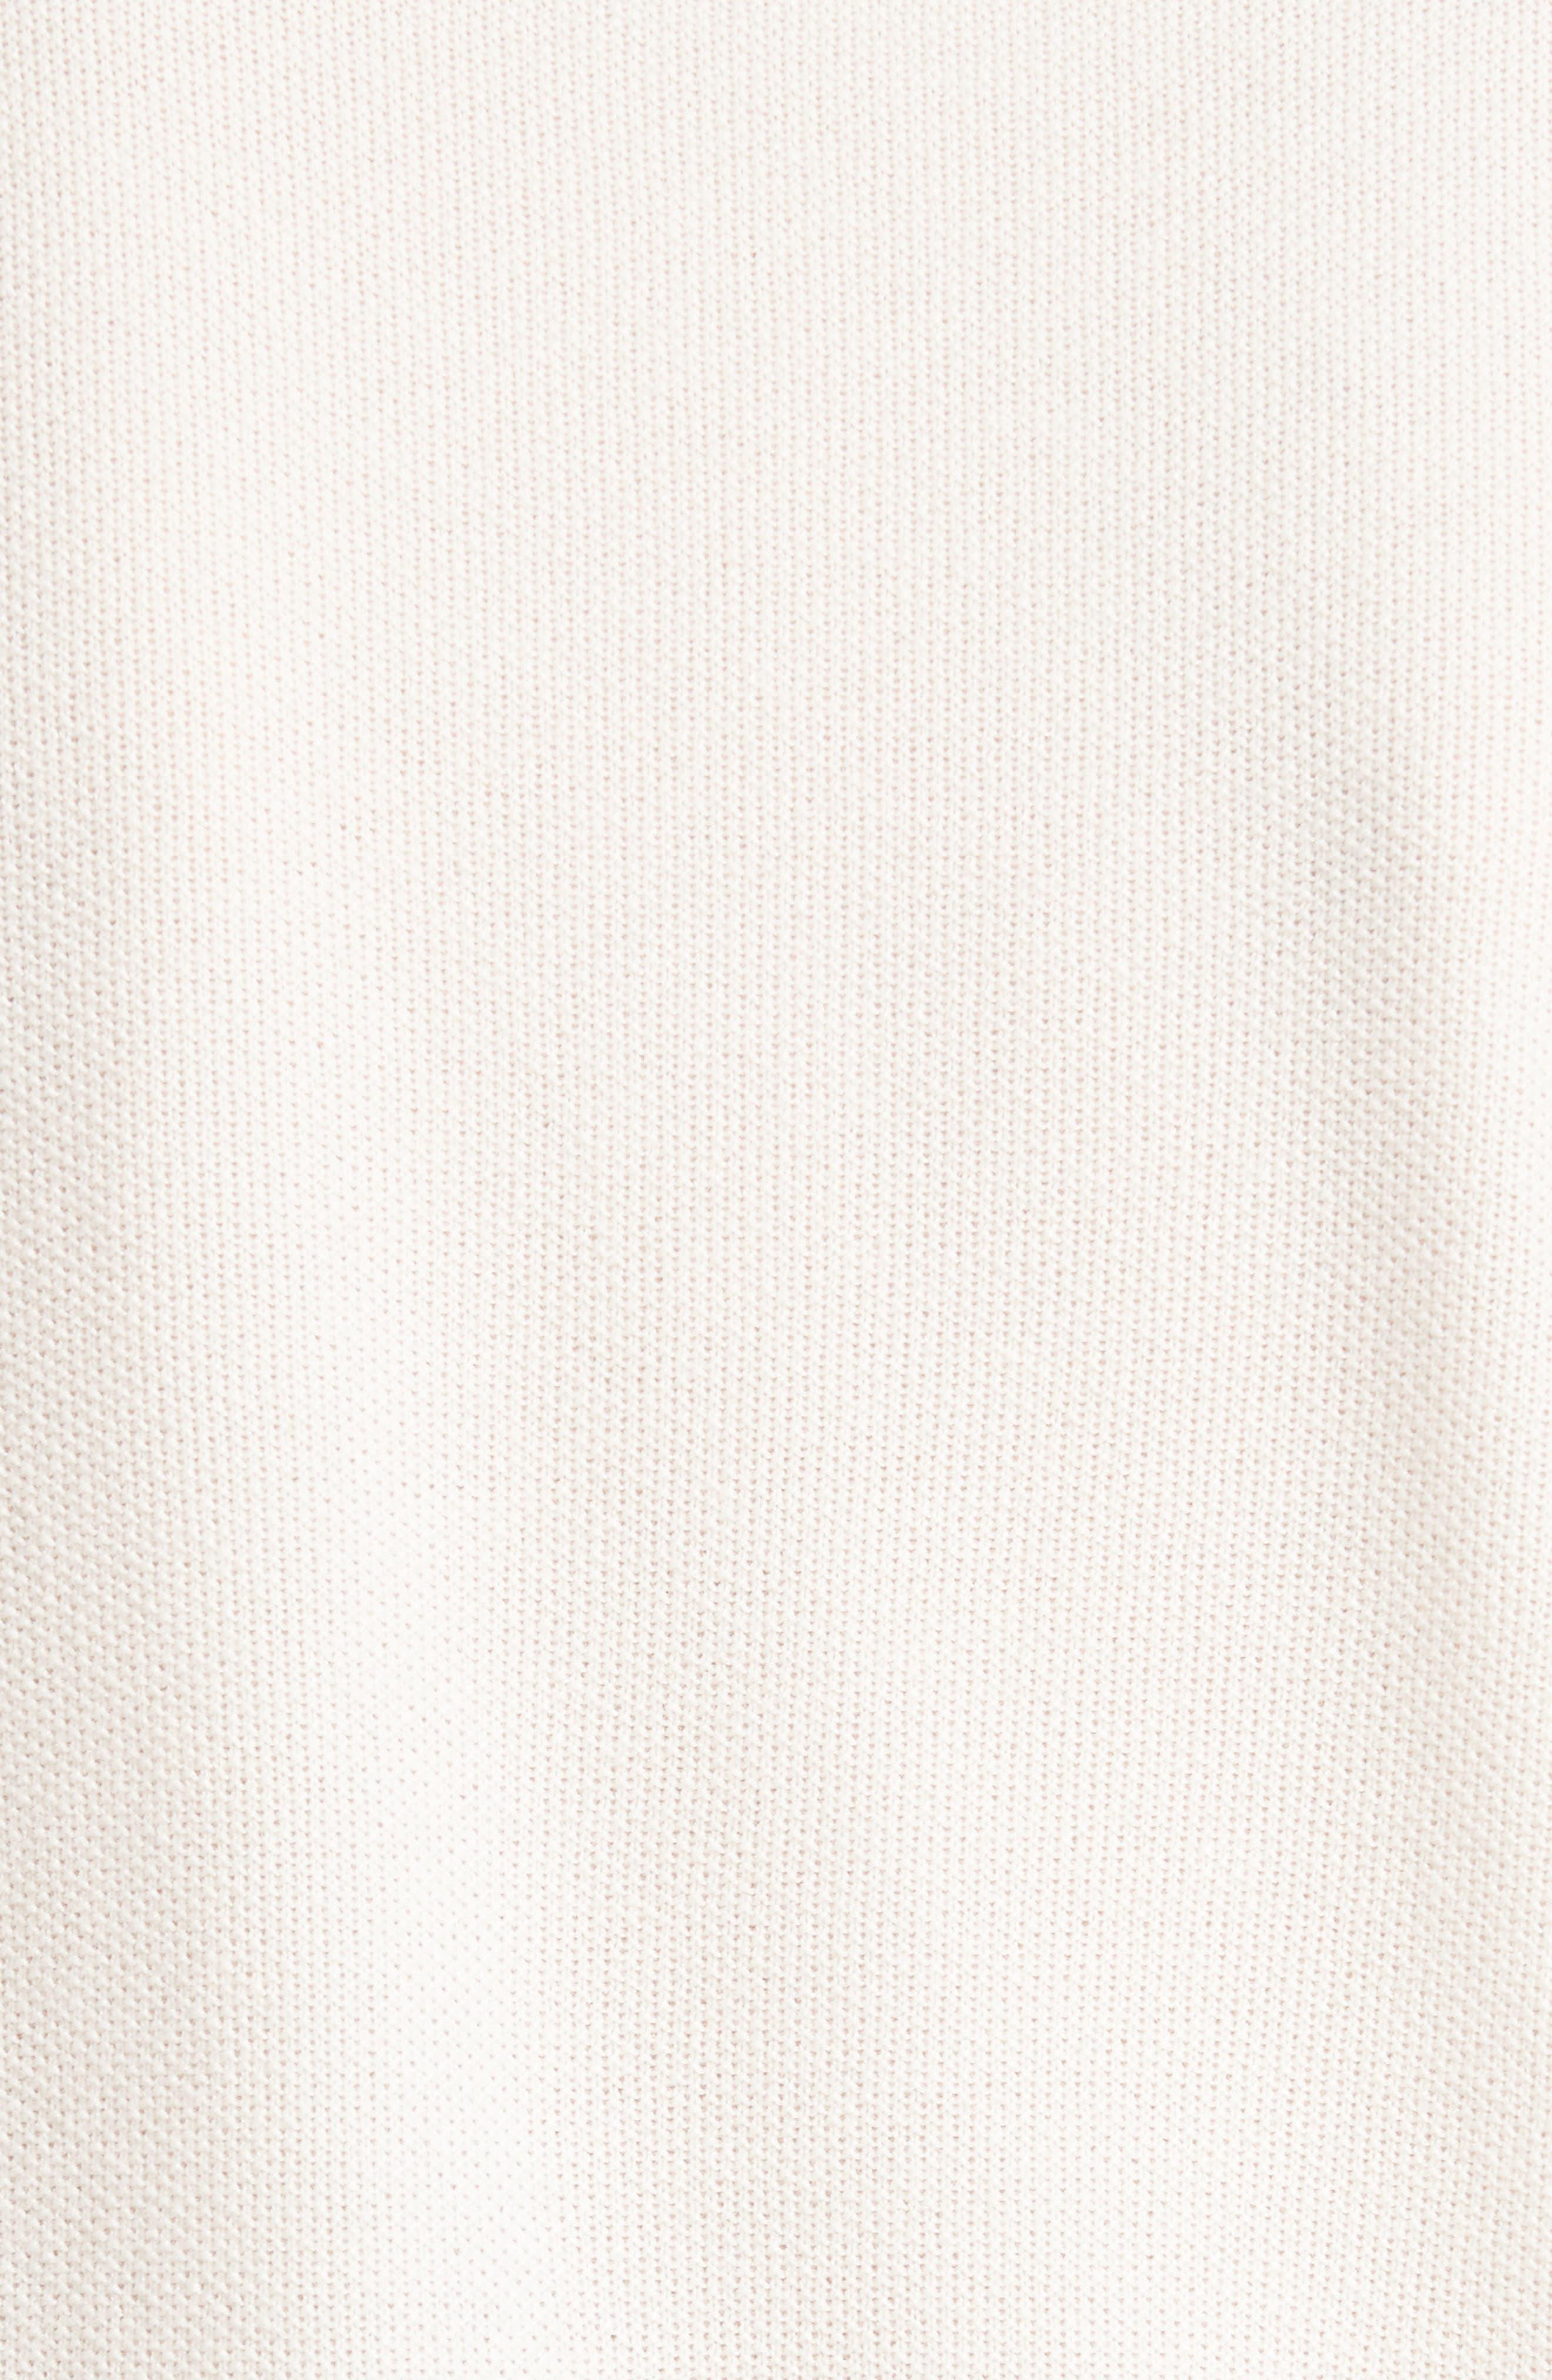 Wool, Silk & Cashmere Micro Popcorn Stitch Sweater,                             Alternate thumbnail 5, color,                             101